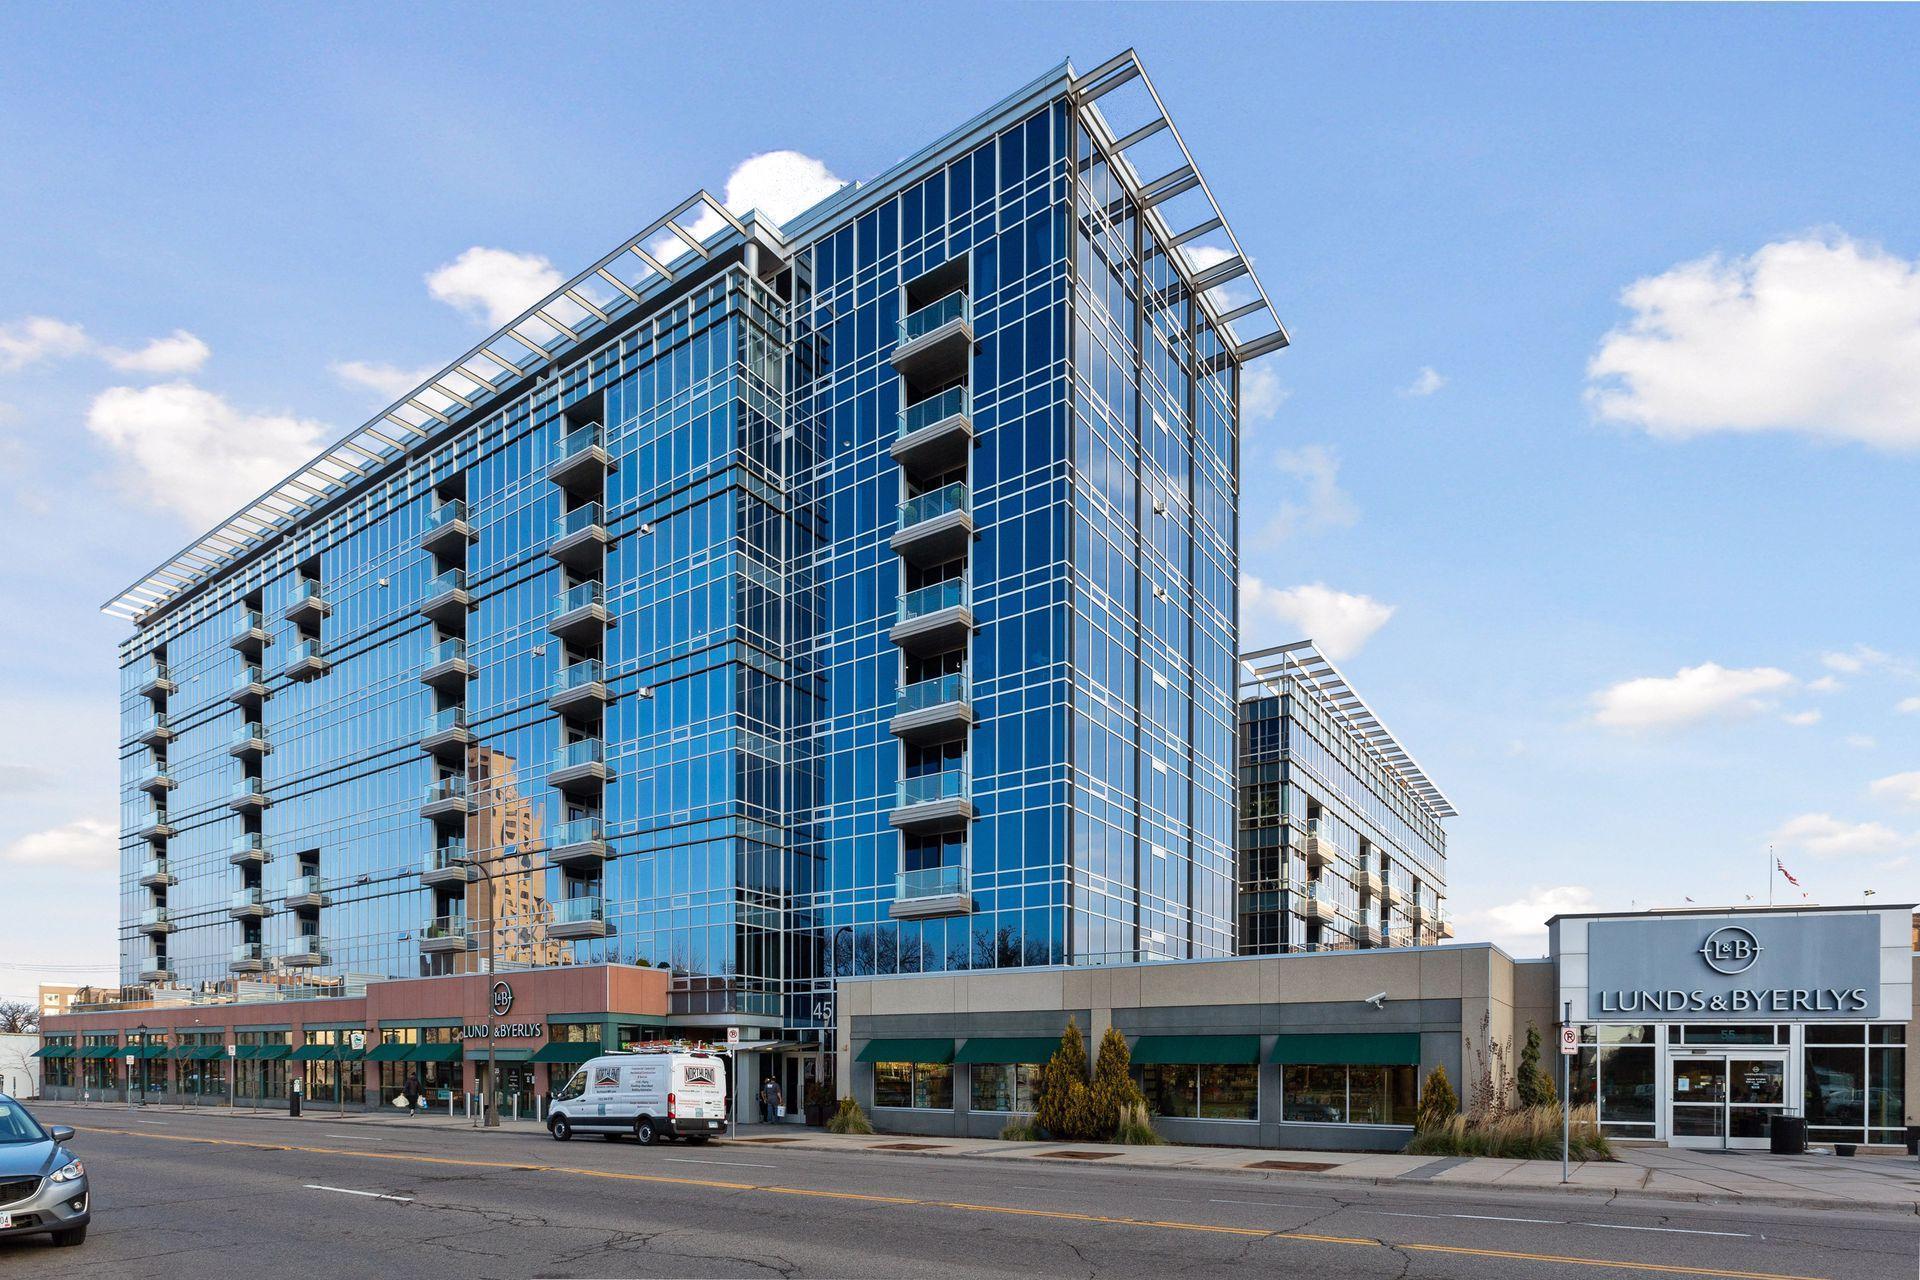 45 University Avenue SE 401, Minneapolis, MN 55414